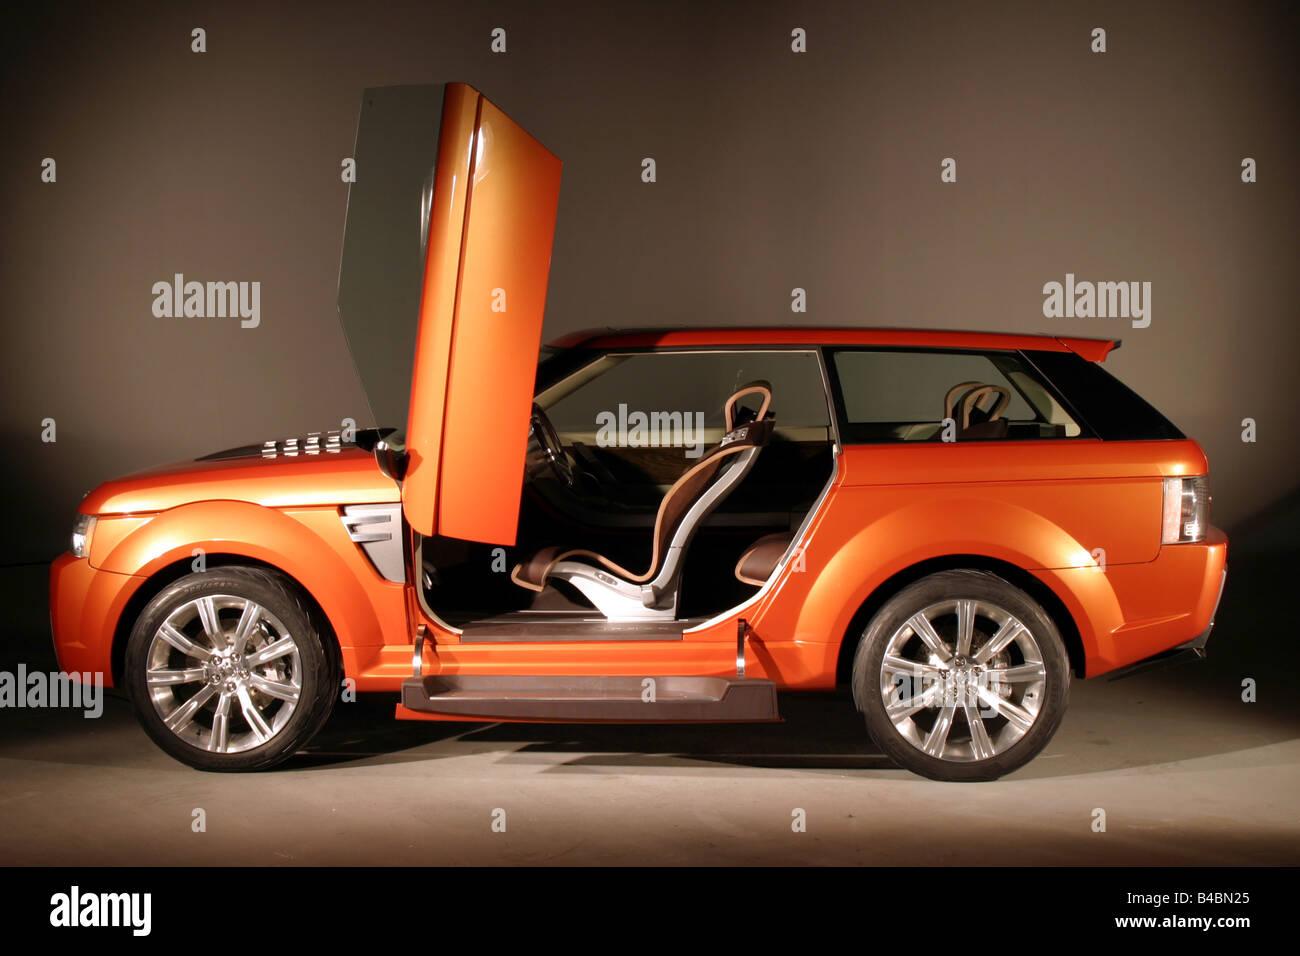 https://c8.alamy.com/comp/B4BN25/car-land-rover-range-stormer-study-draft-study-model-year-2004-orange-B4BN25.jpg